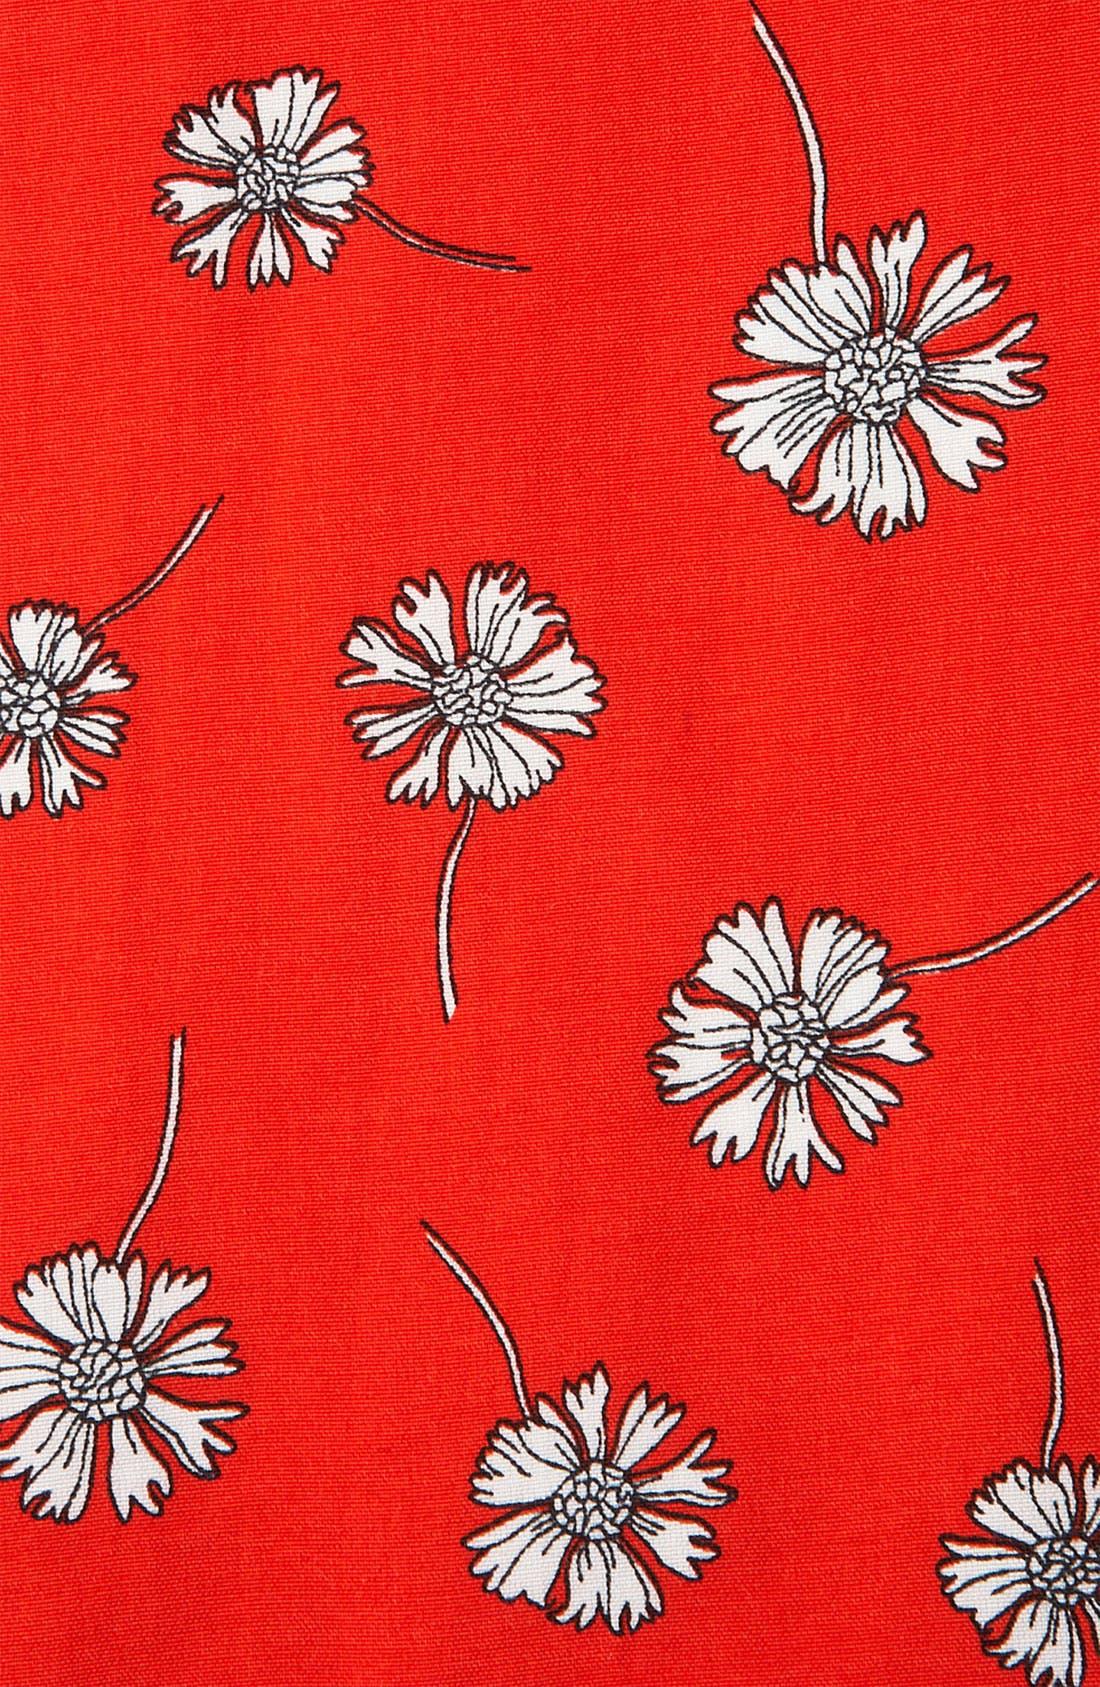 Daisy Print Dress,                             Alternate thumbnail 3, color,                             600